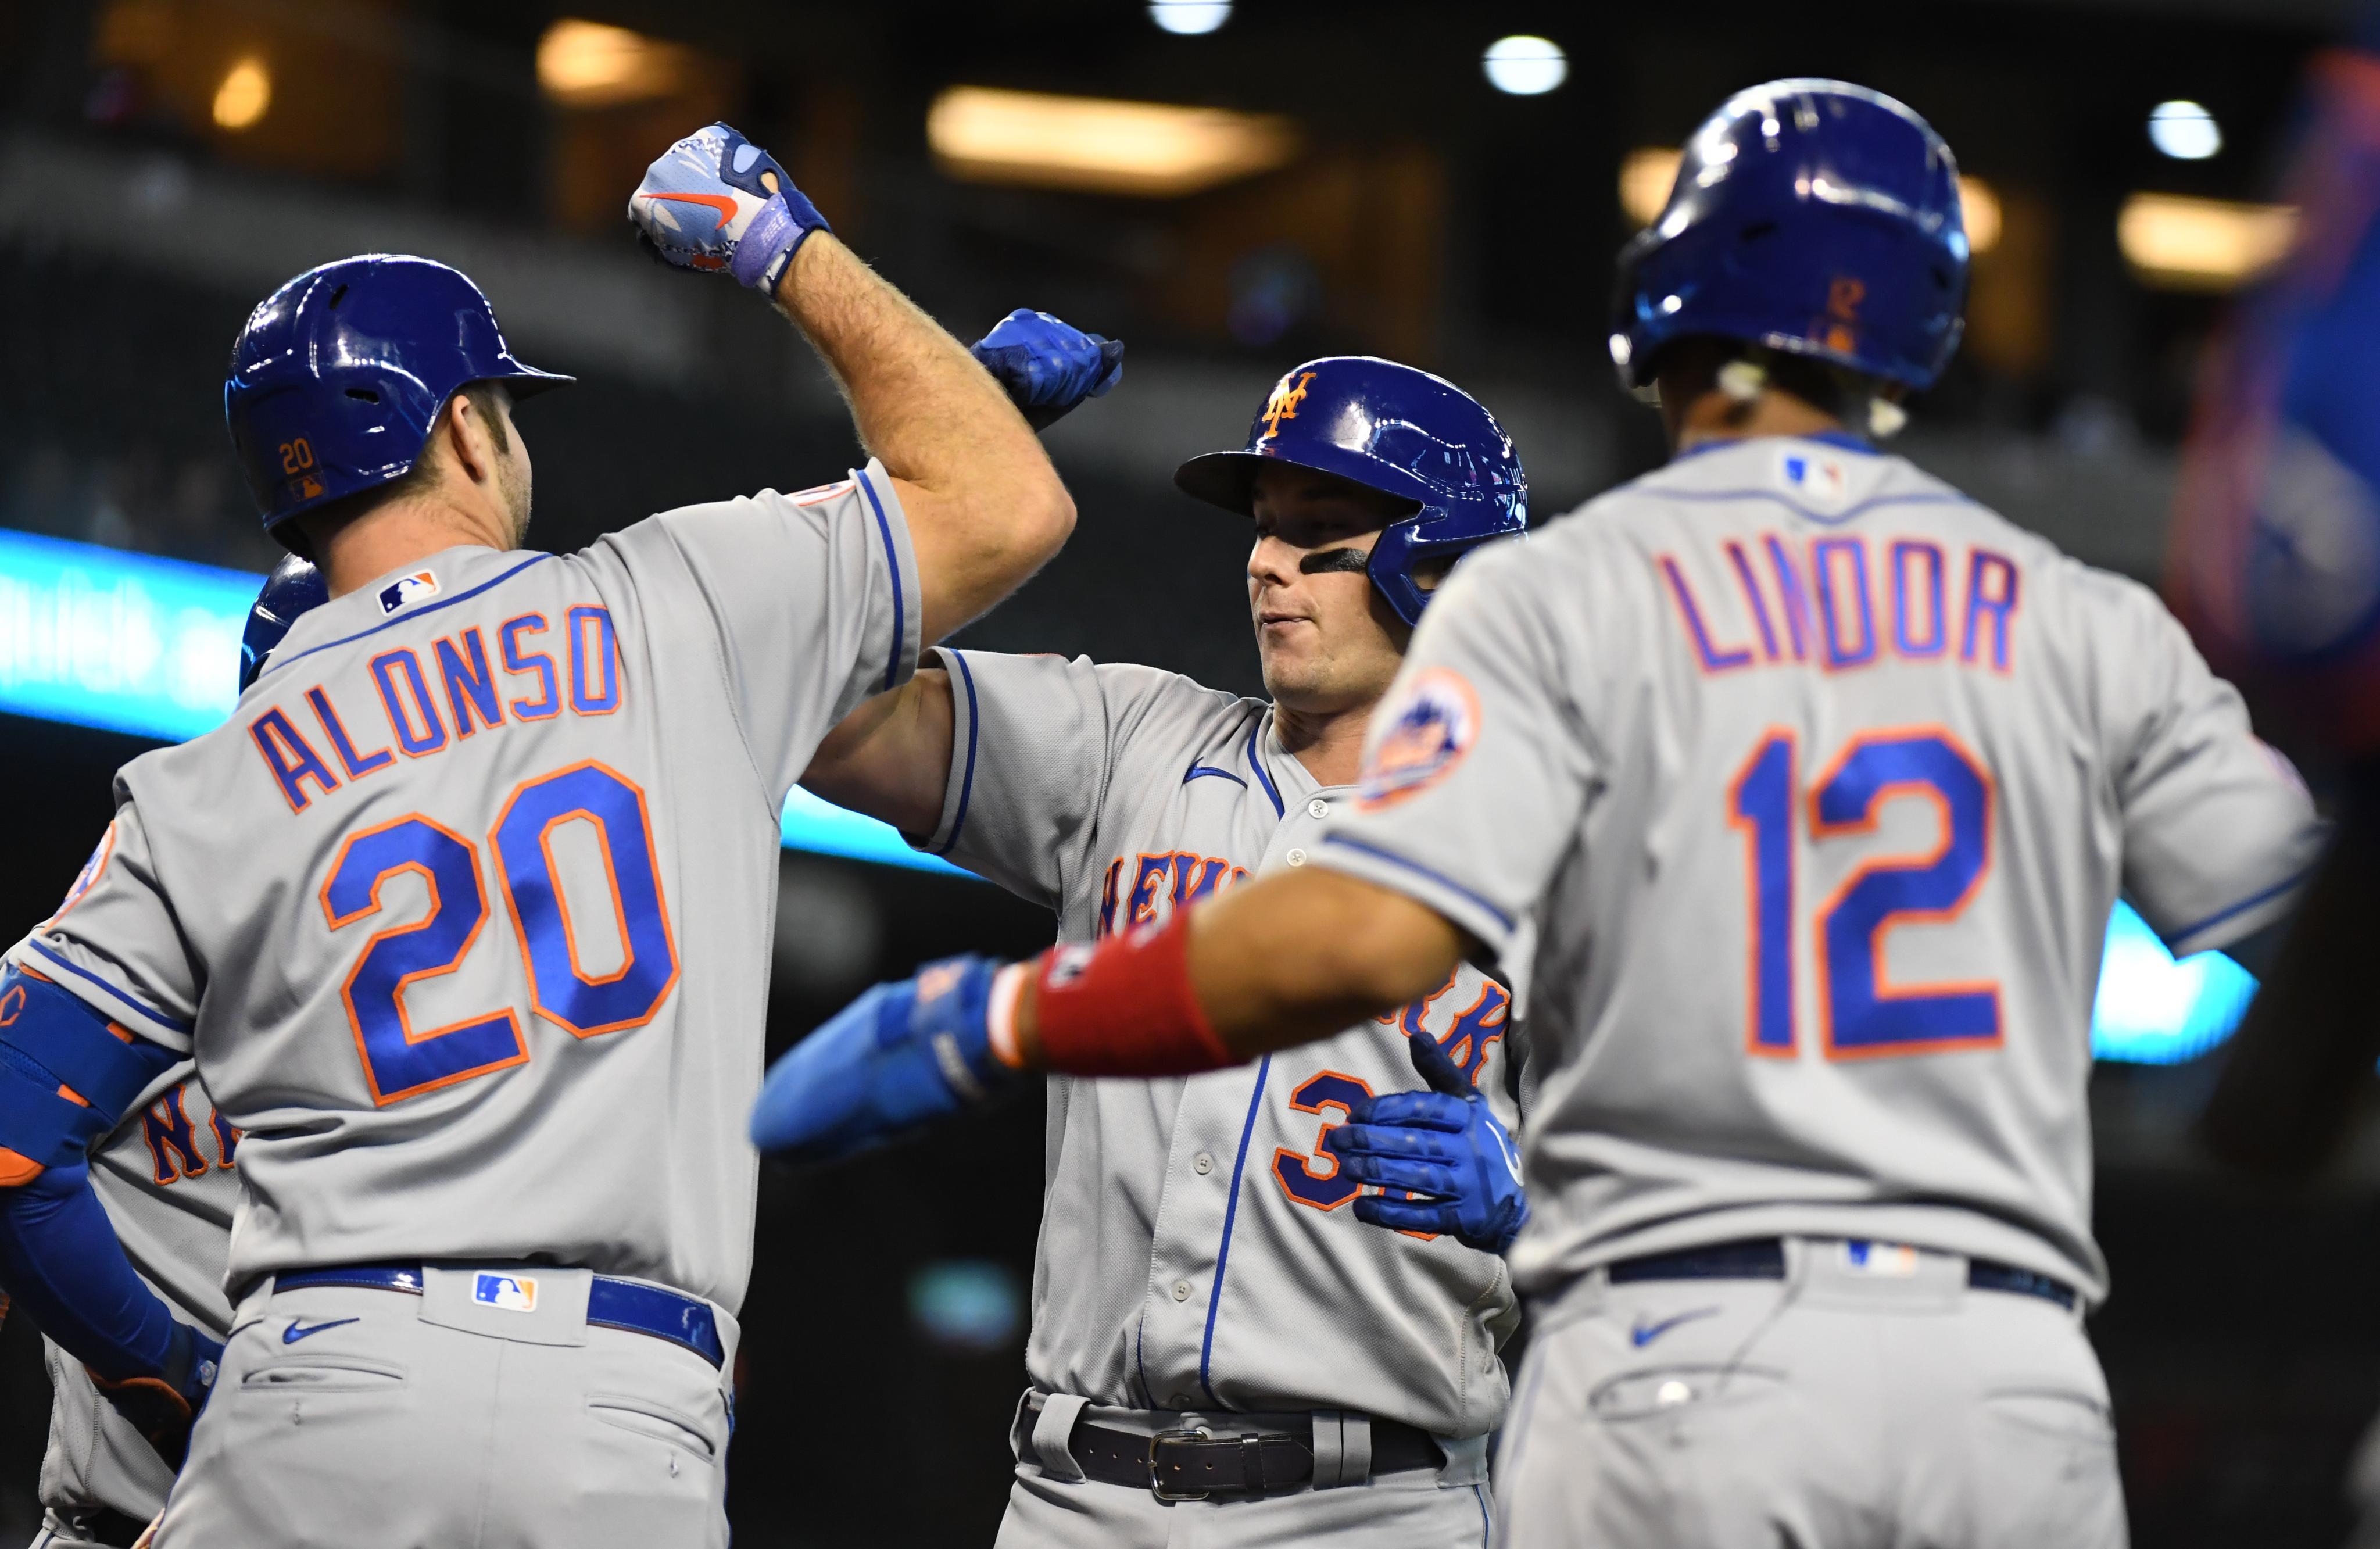 Peluang New York Mets